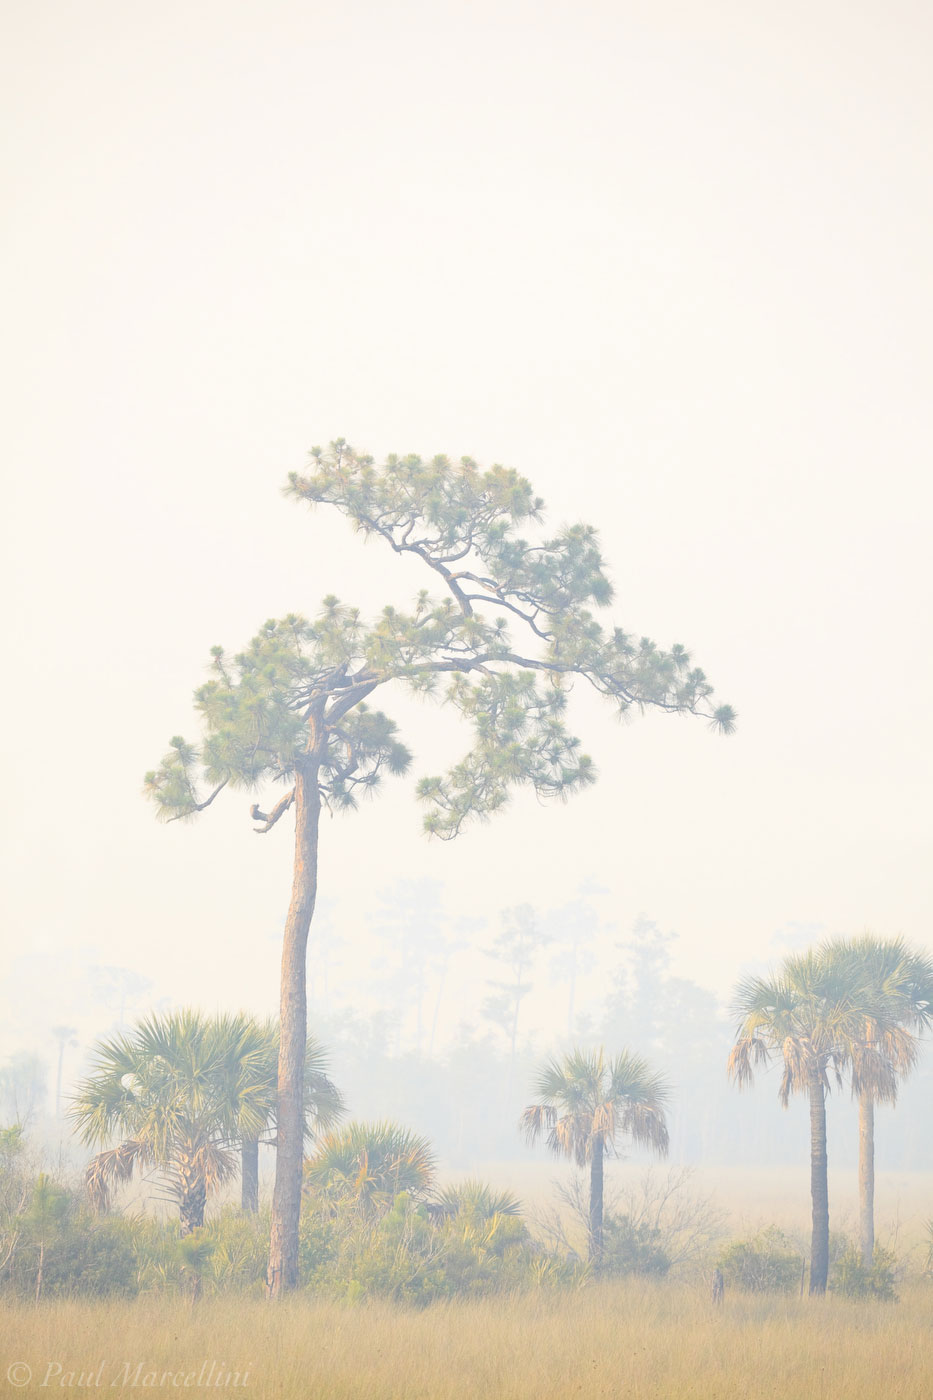 big cypress, fire, smoke, trees, Florida, nature, photography, photo